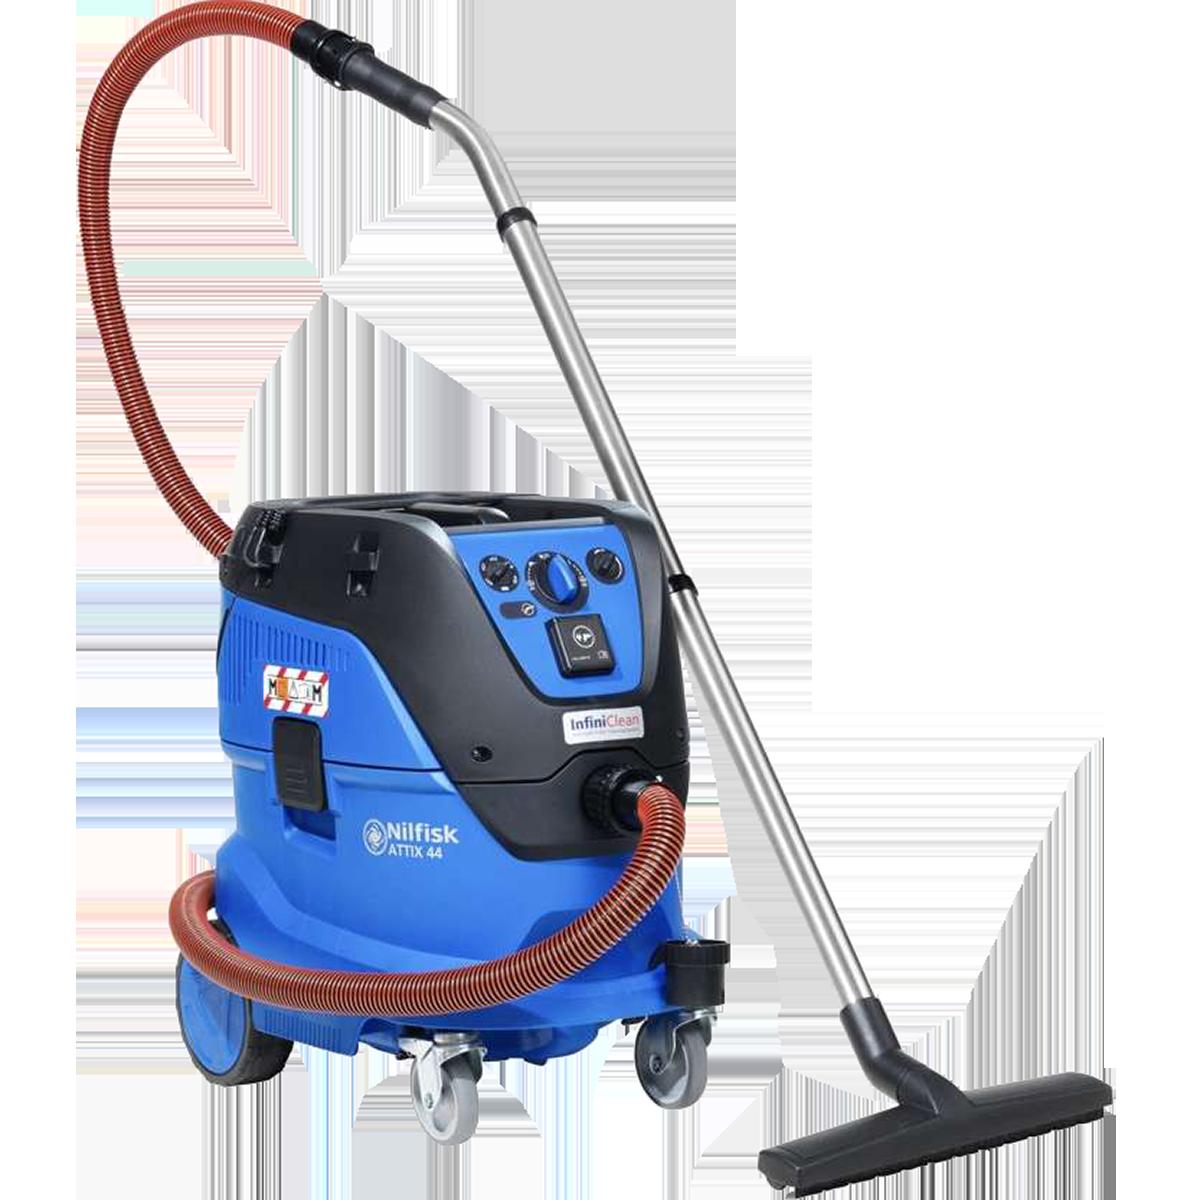 Nilfisk Attix 44 21 Wet/Dry Vacuum